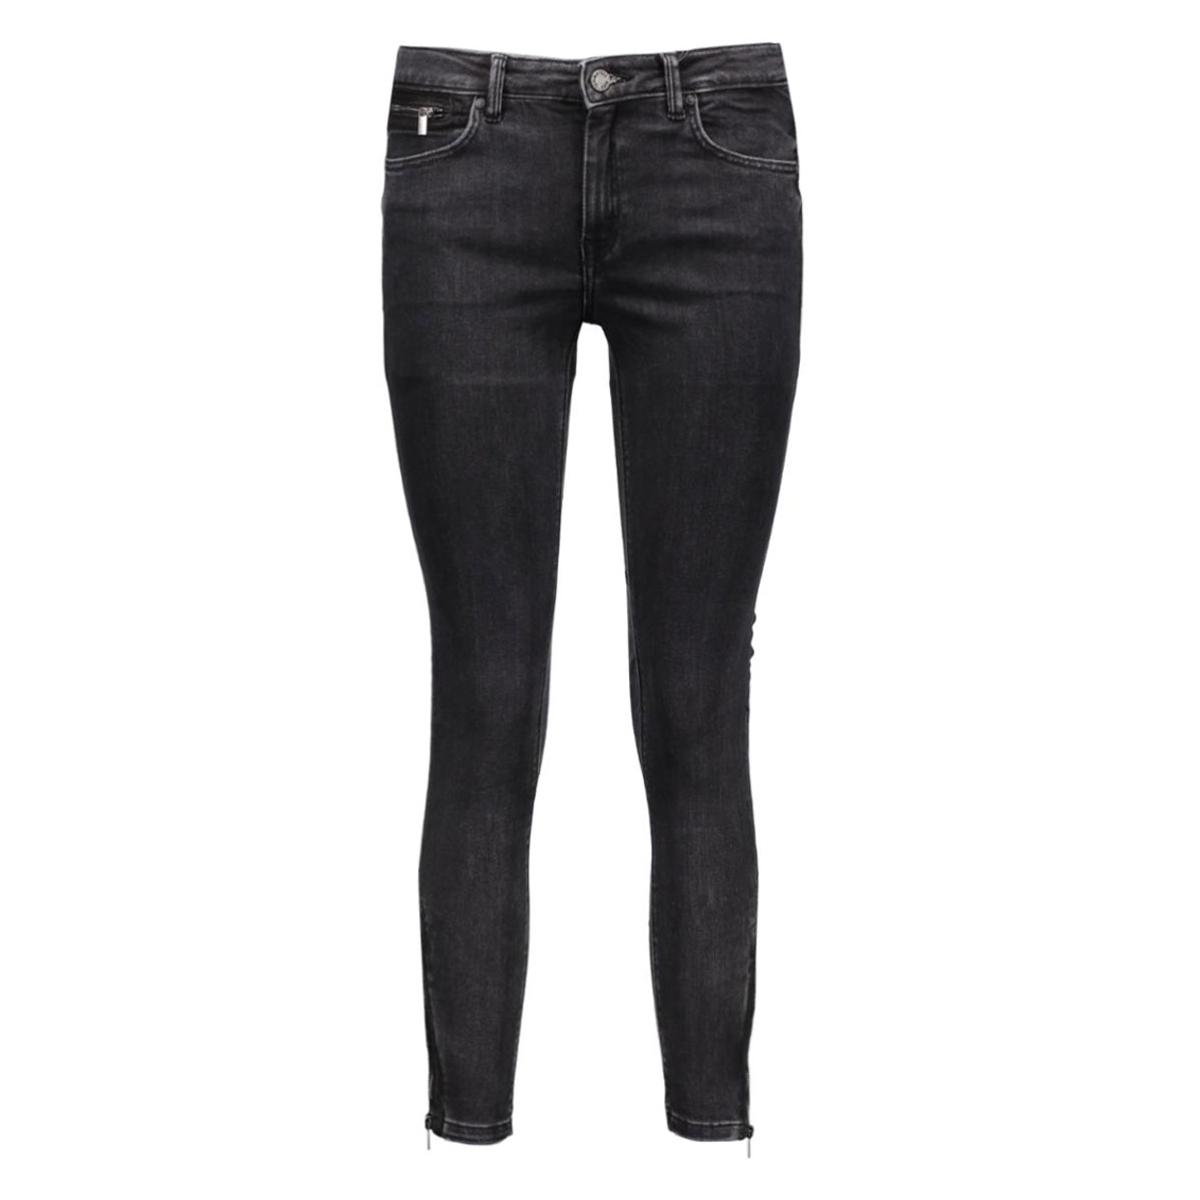 jeans tattoo7 mango broeken 73000062-tn